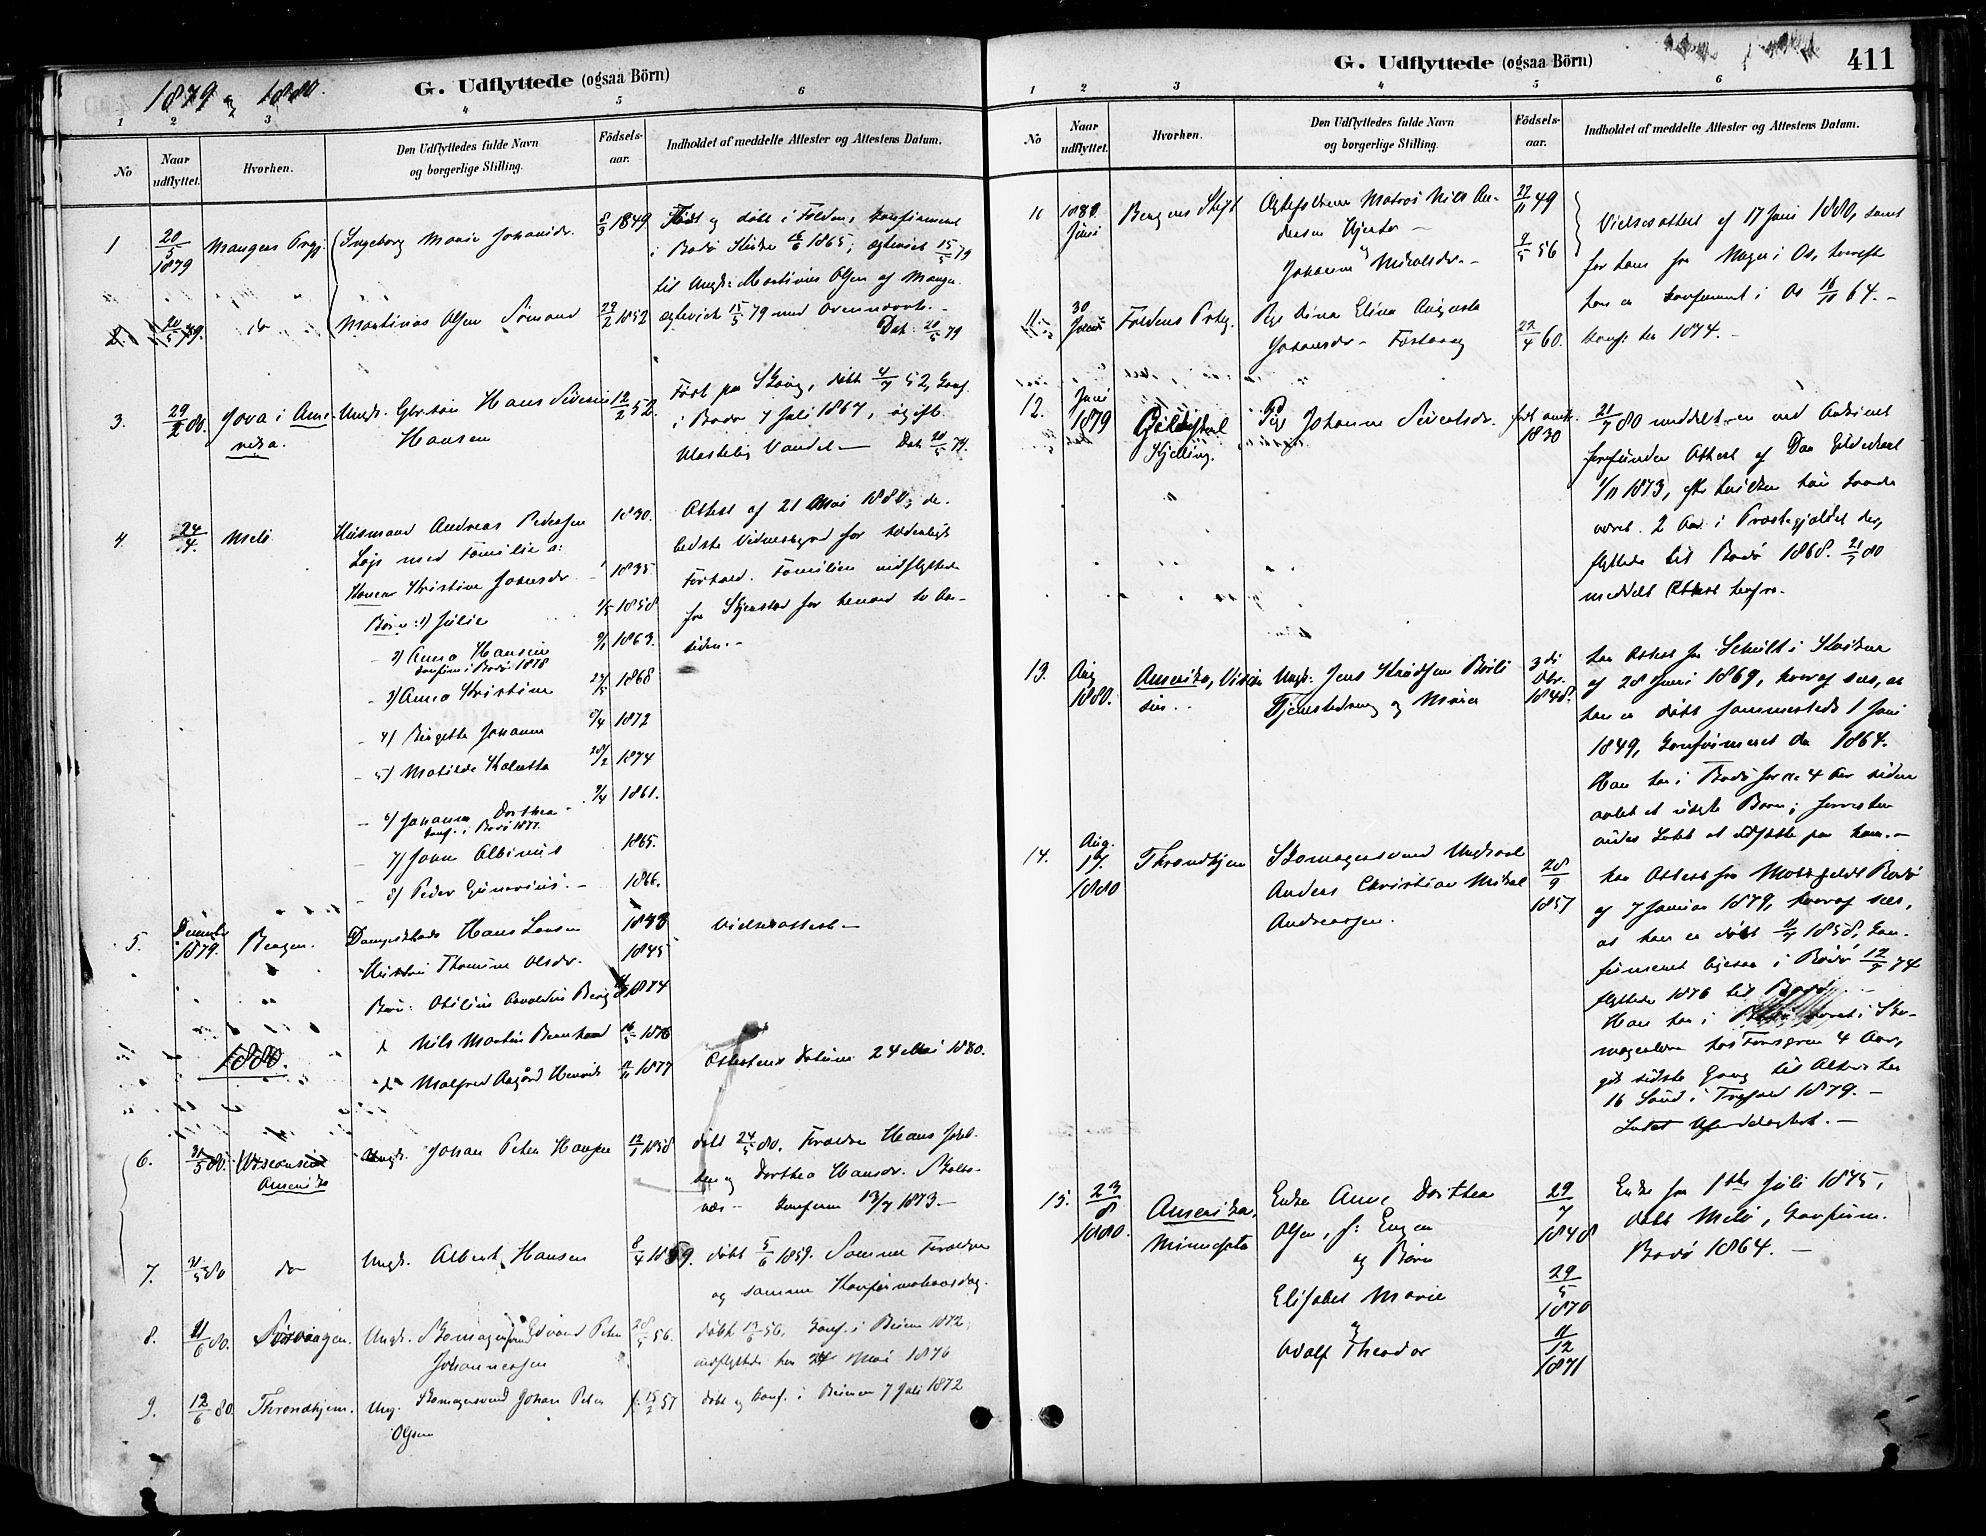 SAT, Ministerialprotokoller, klokkerbøker og fødselsregistre - Nordland, 802/L0054: Ministerialbok nr. 802A01, 1879-1893, s. 411